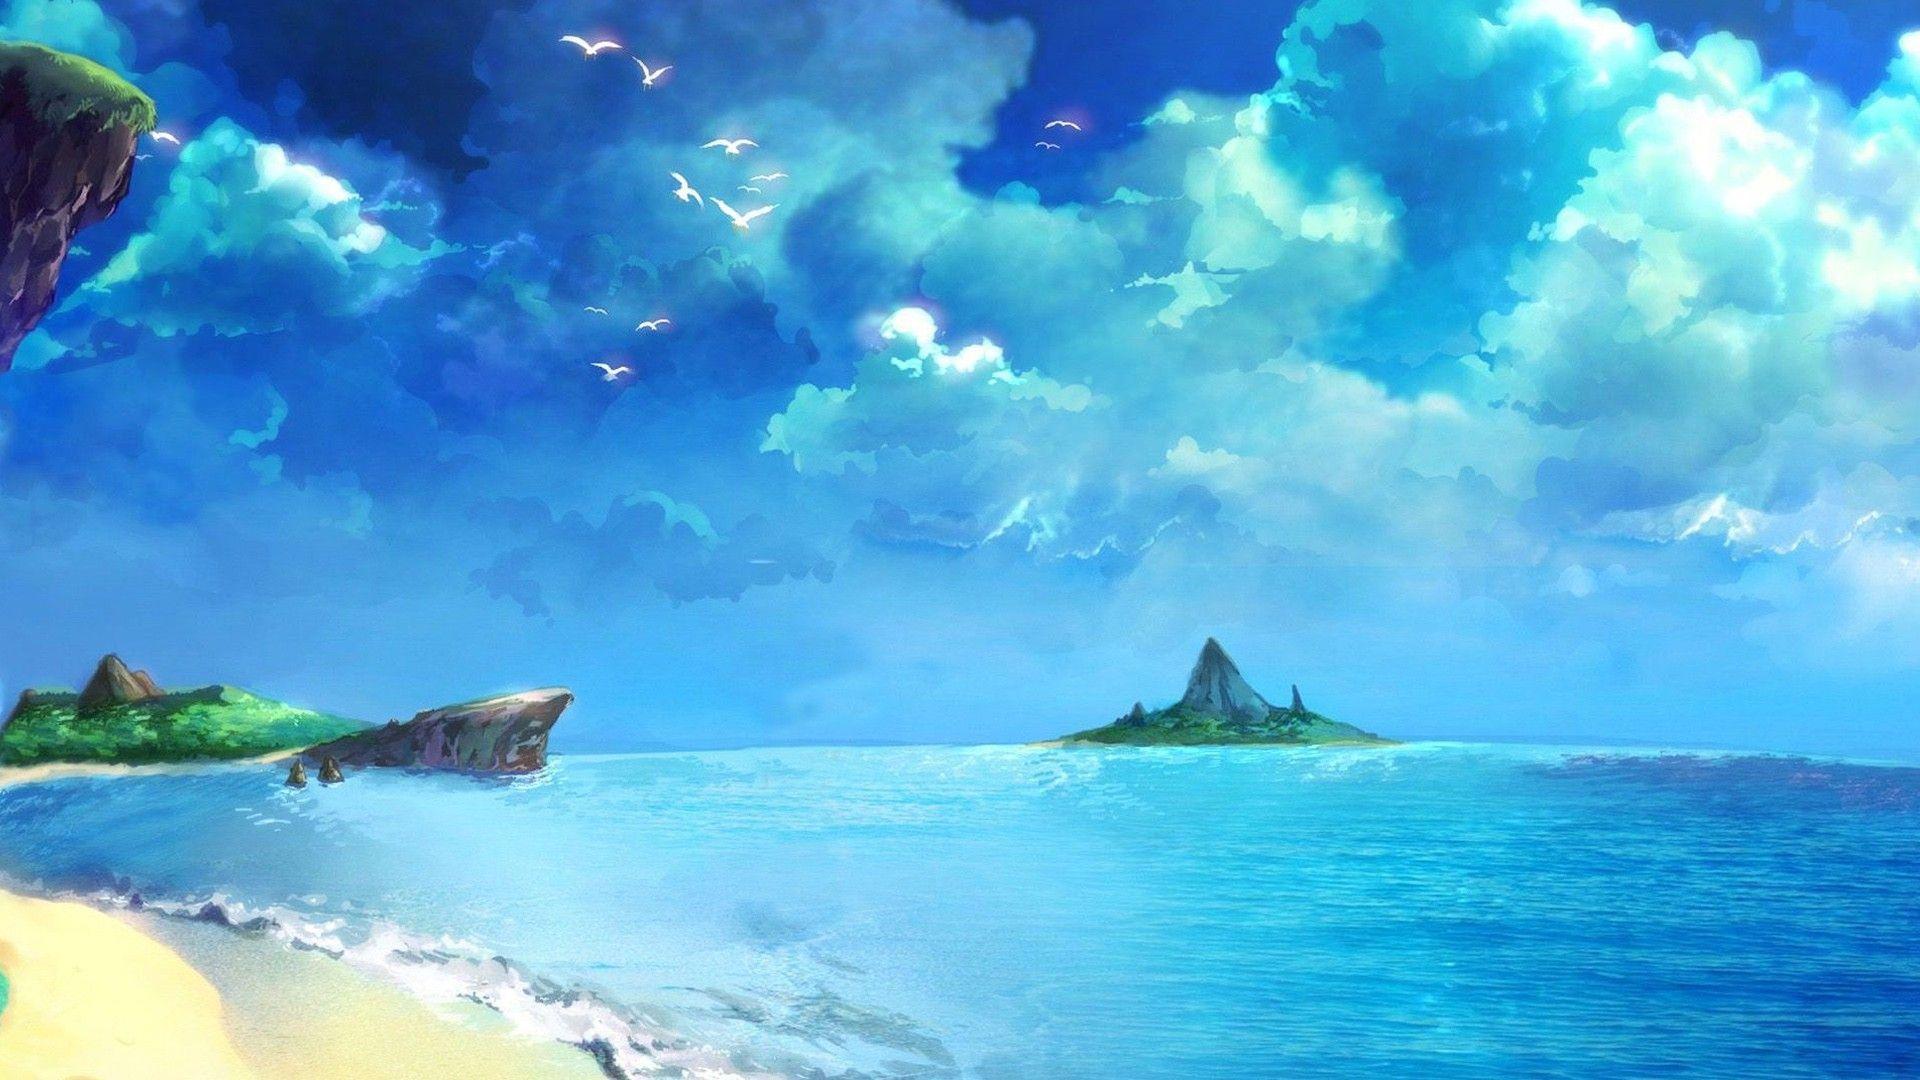 Chrono Trigger Beach Drawing Blue Ocean Anime Scenery Scenery Wallpaper Beach Drawing